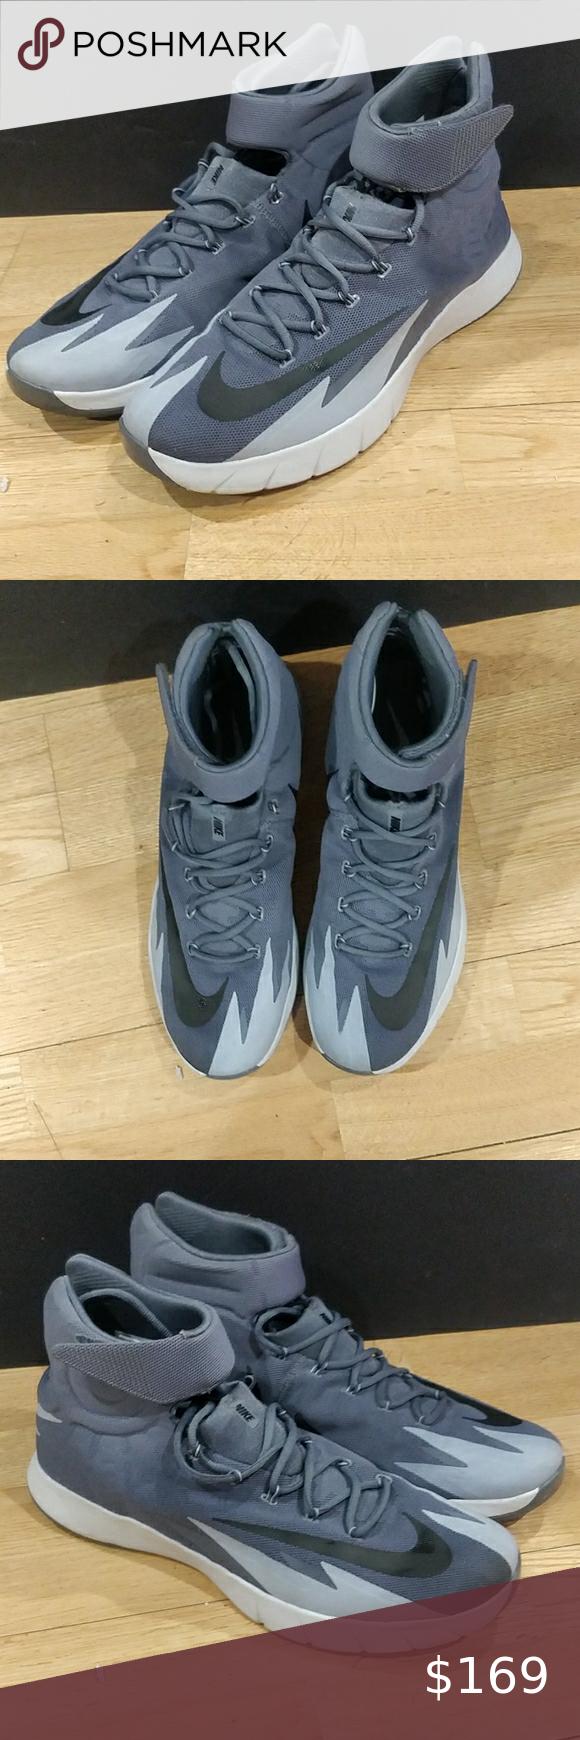 15 Nike ZOOM in 2020 | Nike zoom, Nike